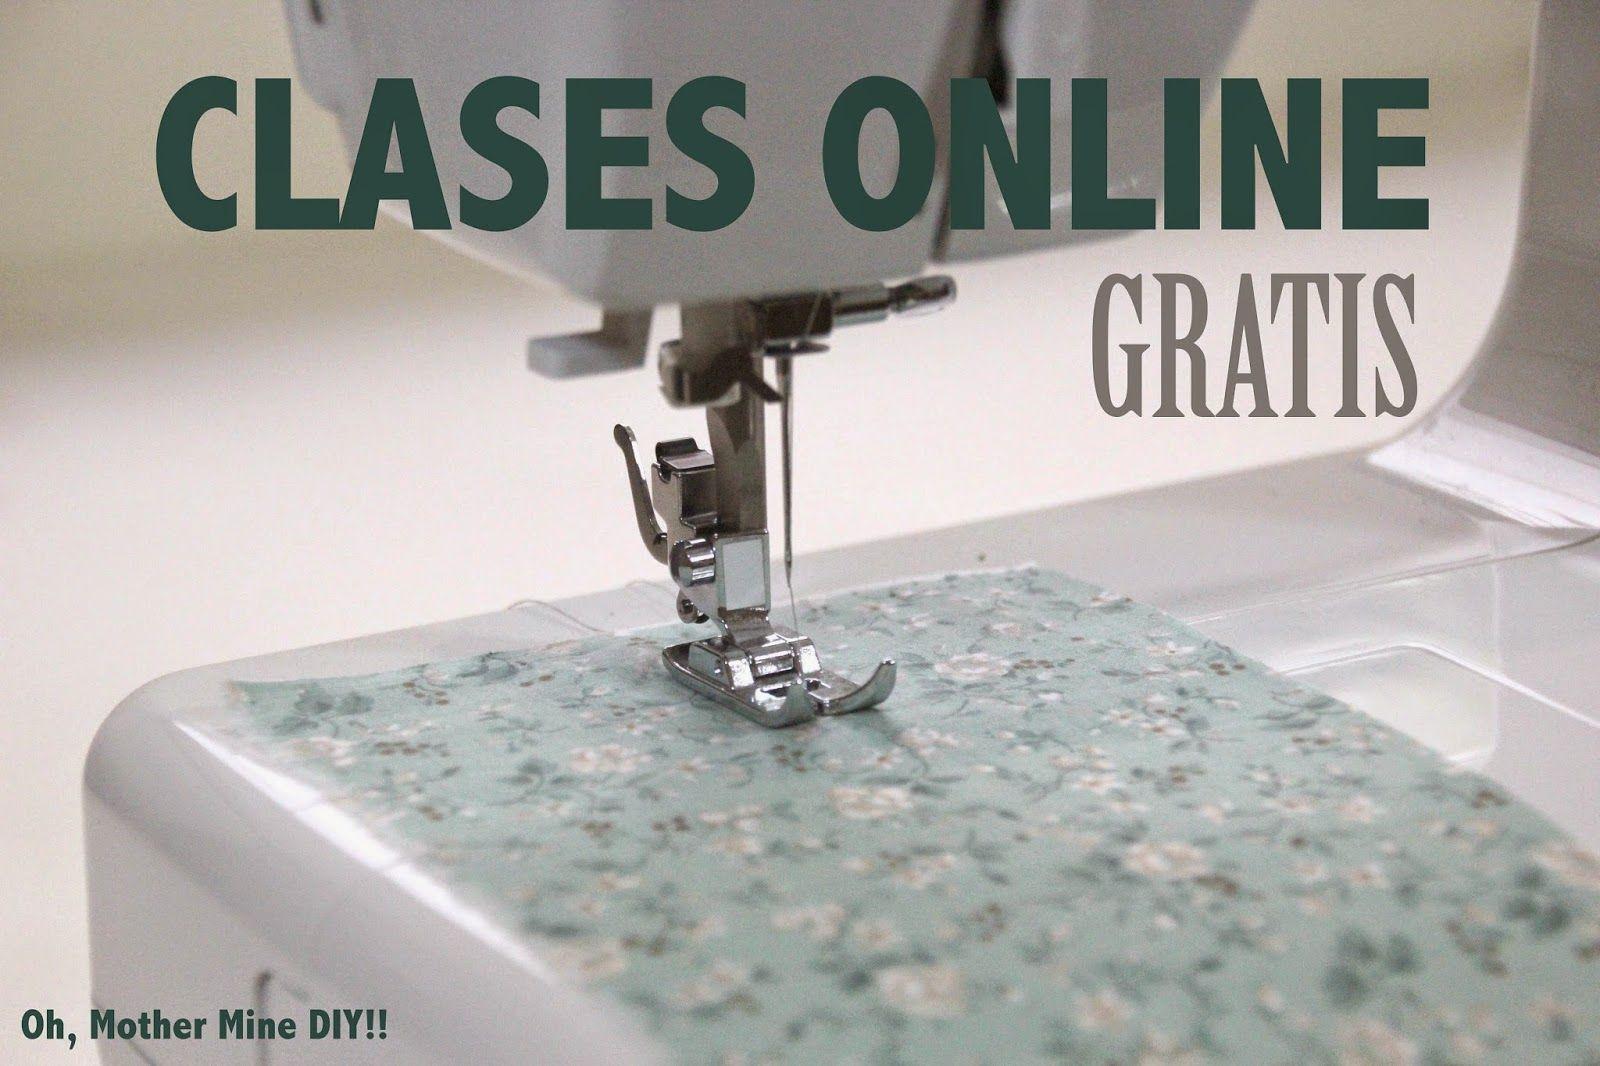 clases de costura gratis online aprender a coser. Blog de costura y ...